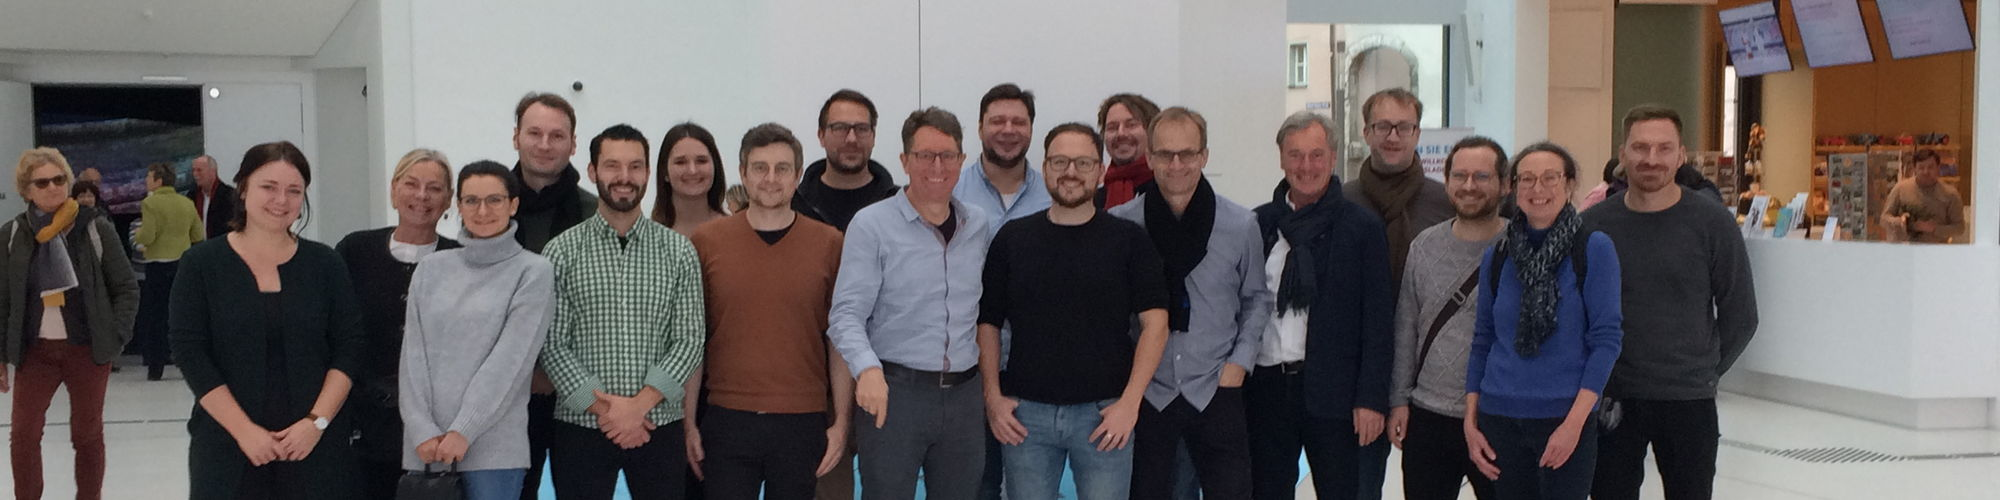 ENDRES + TIEFENBACHER Architekten PartGmbB